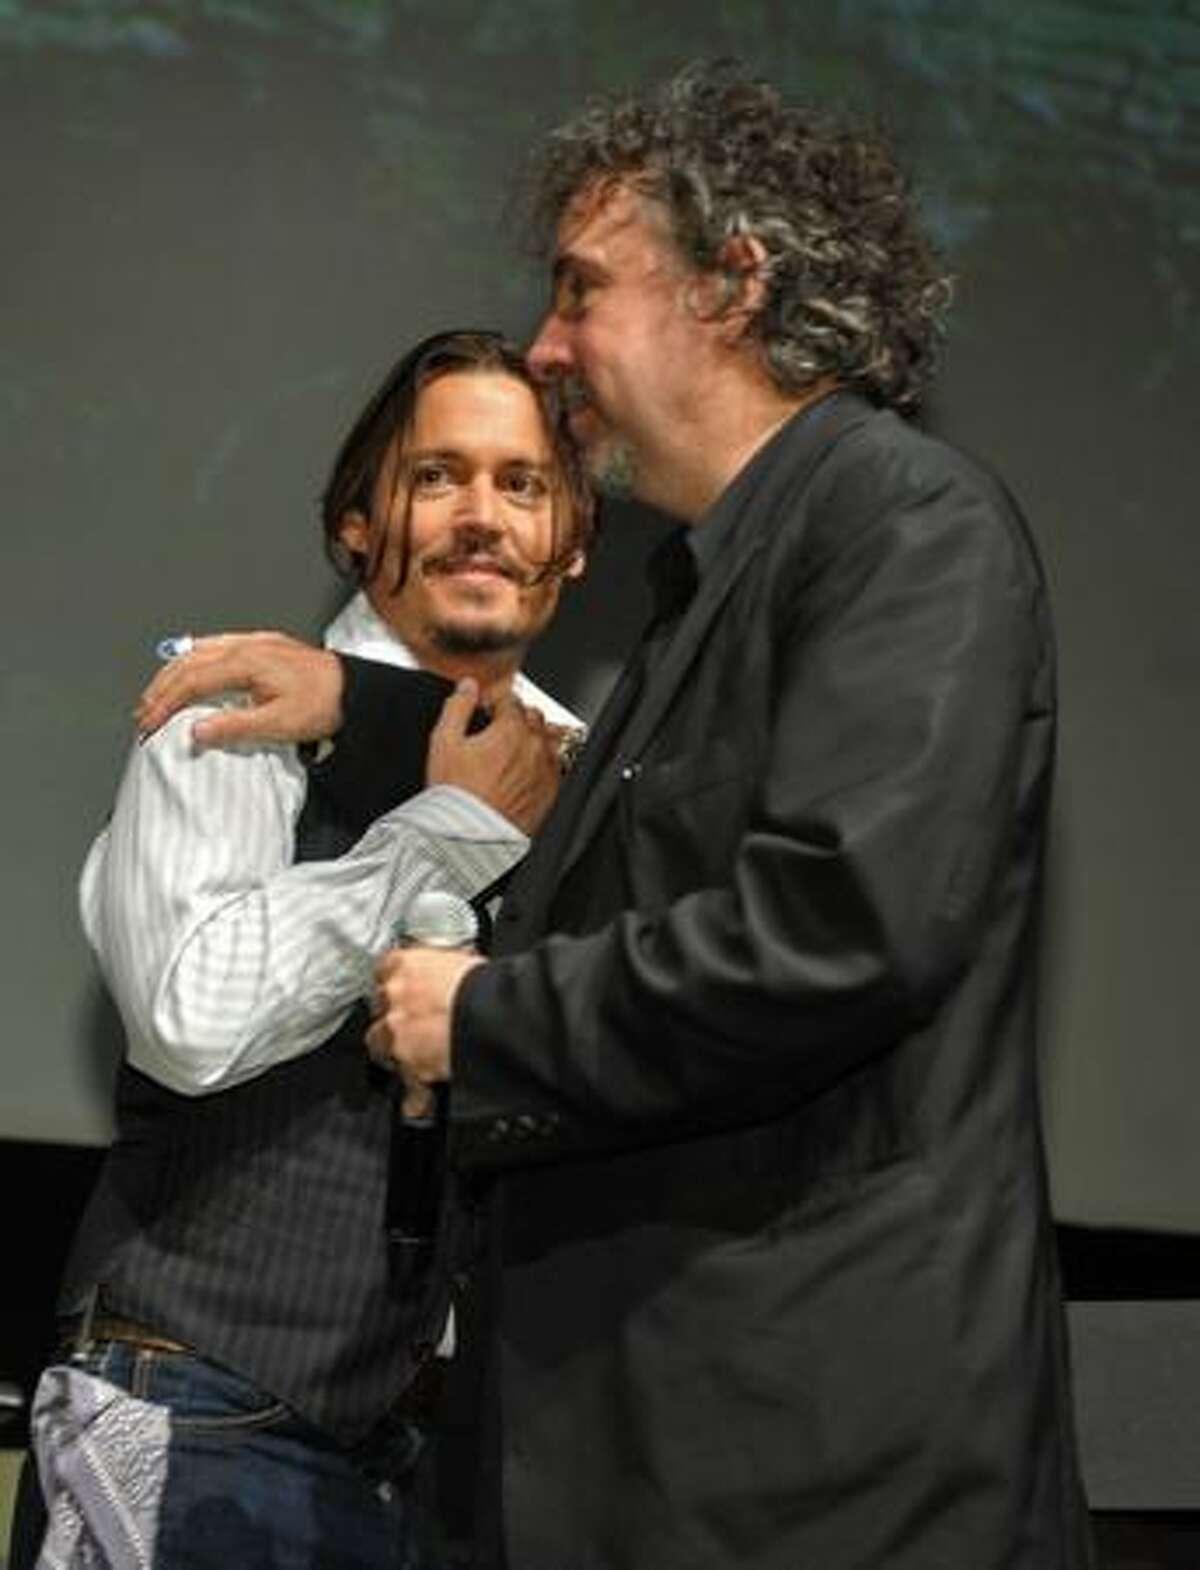 (L-R) Actor Johnny Depp and director Tim Burton speak at